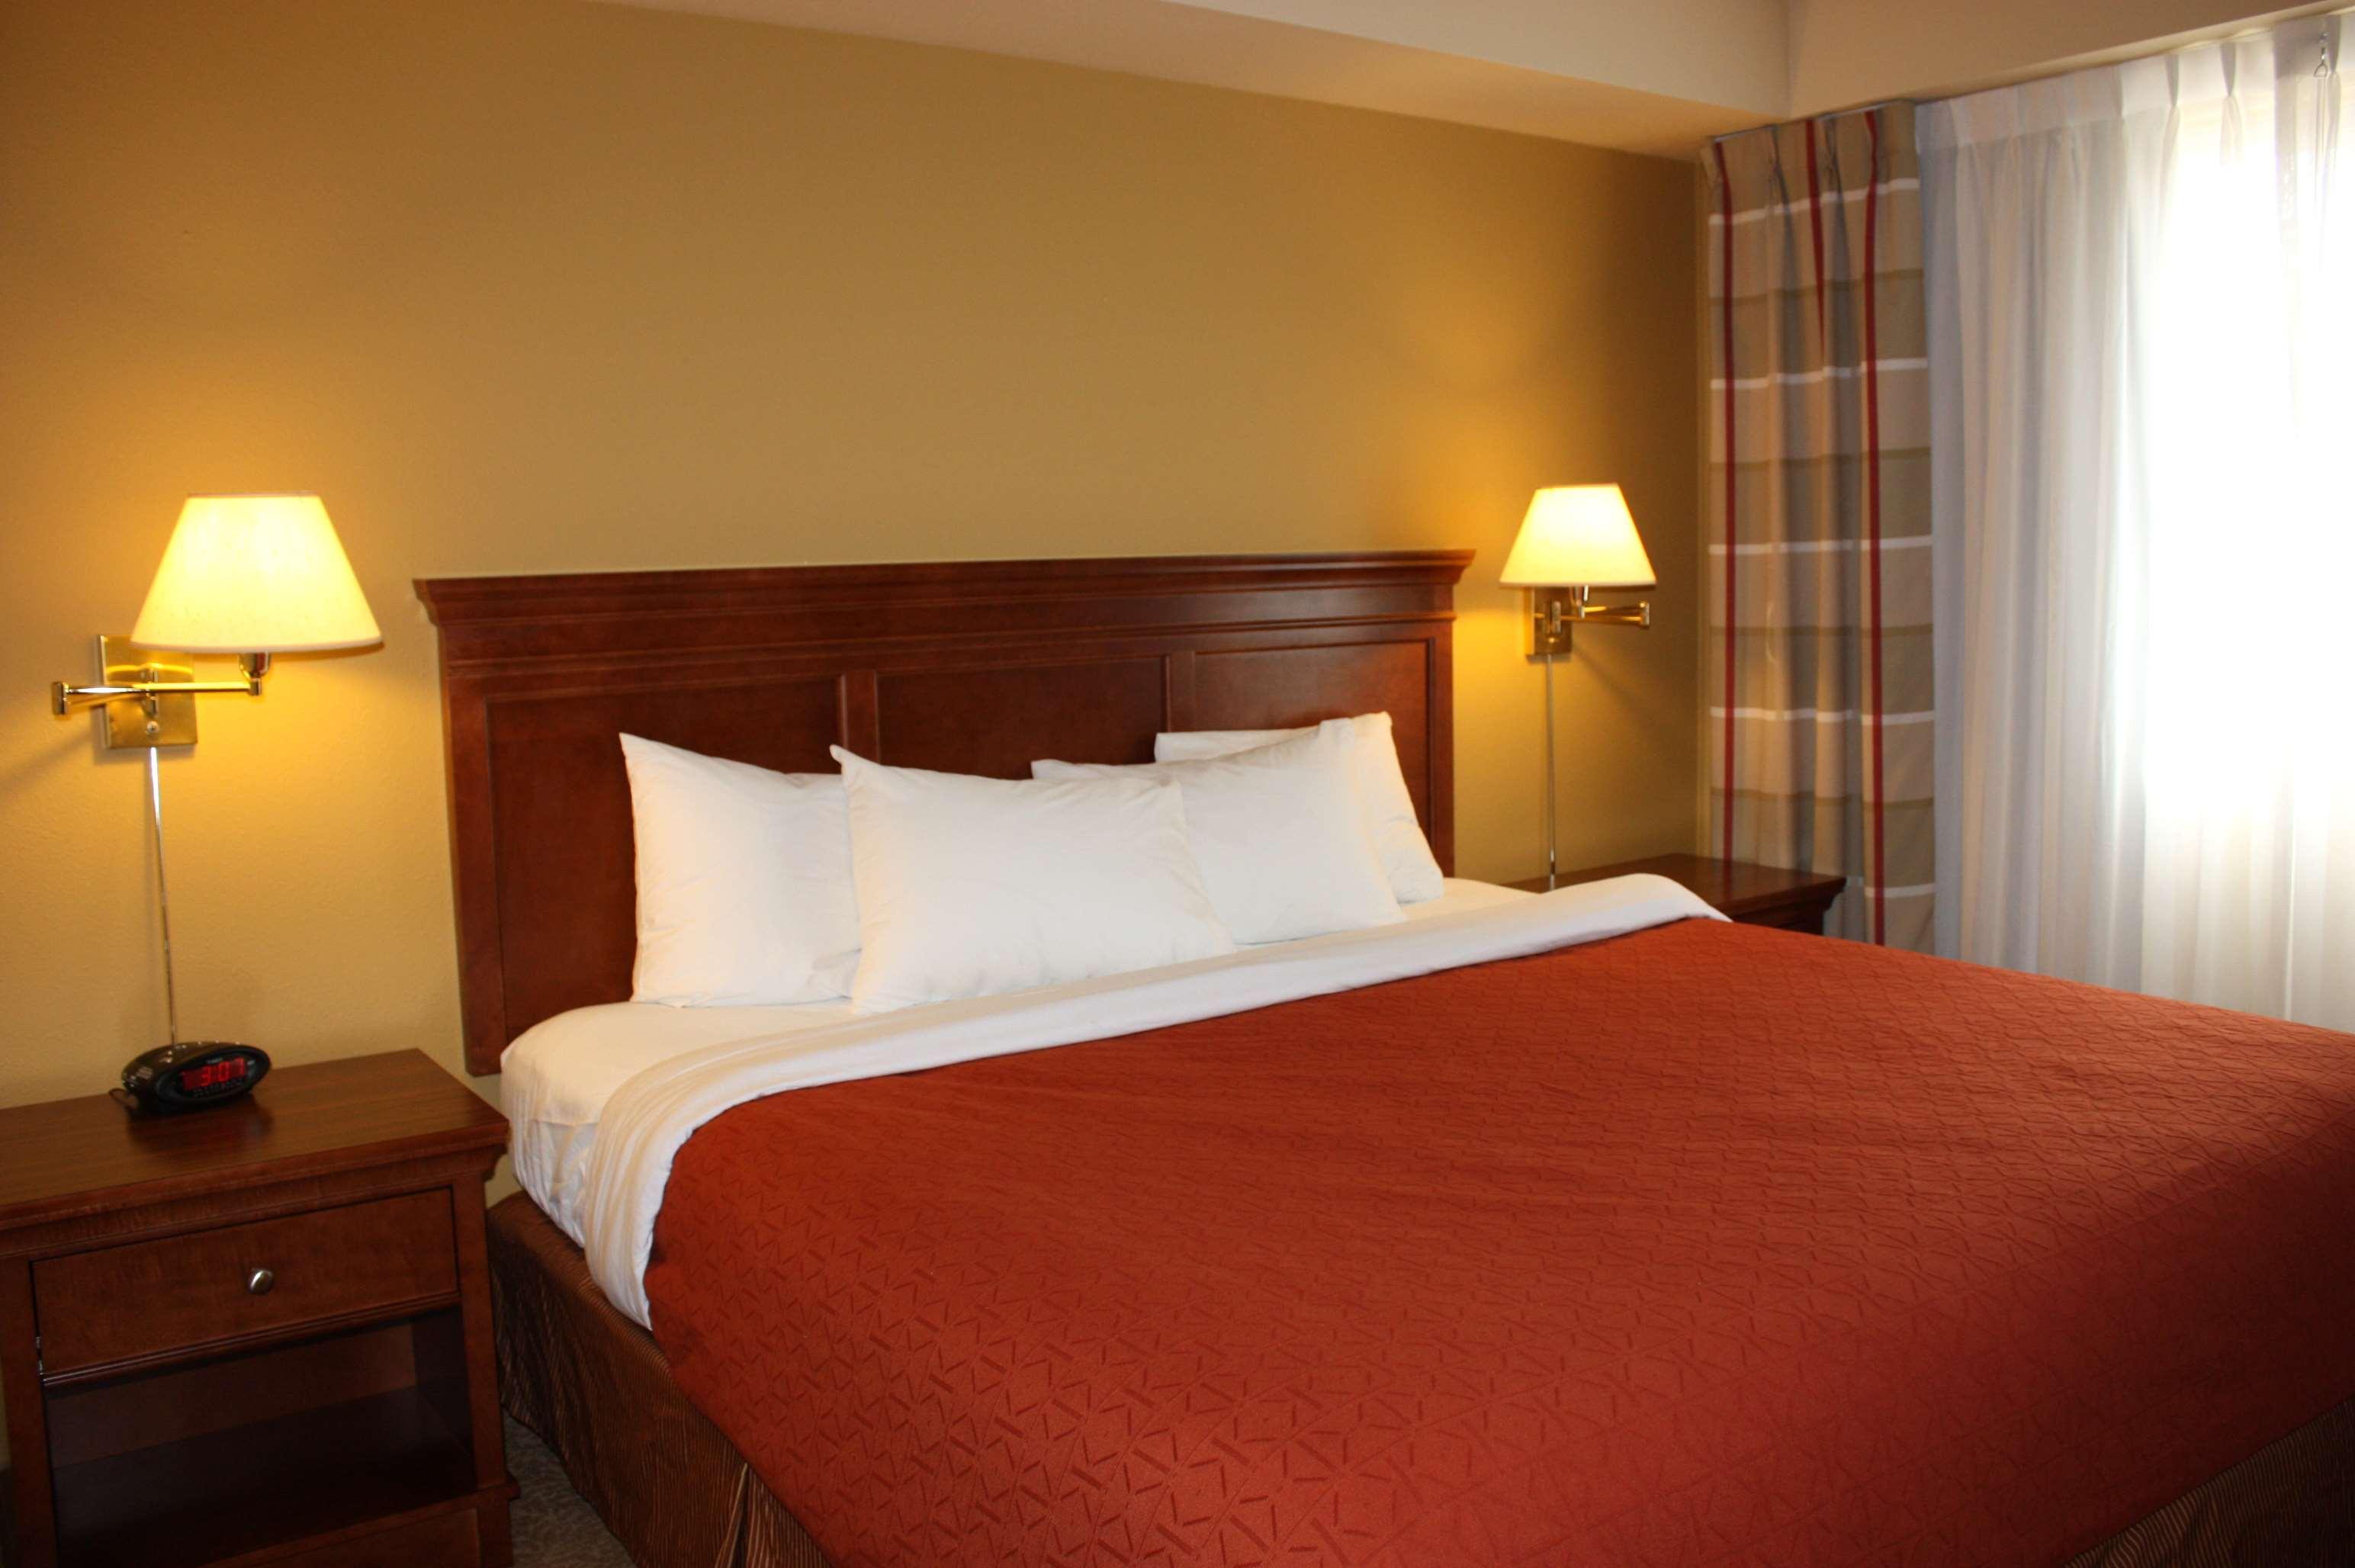 Country Inn & Suites by Radisson, Regina, SK in Regina: Suite Bedroom